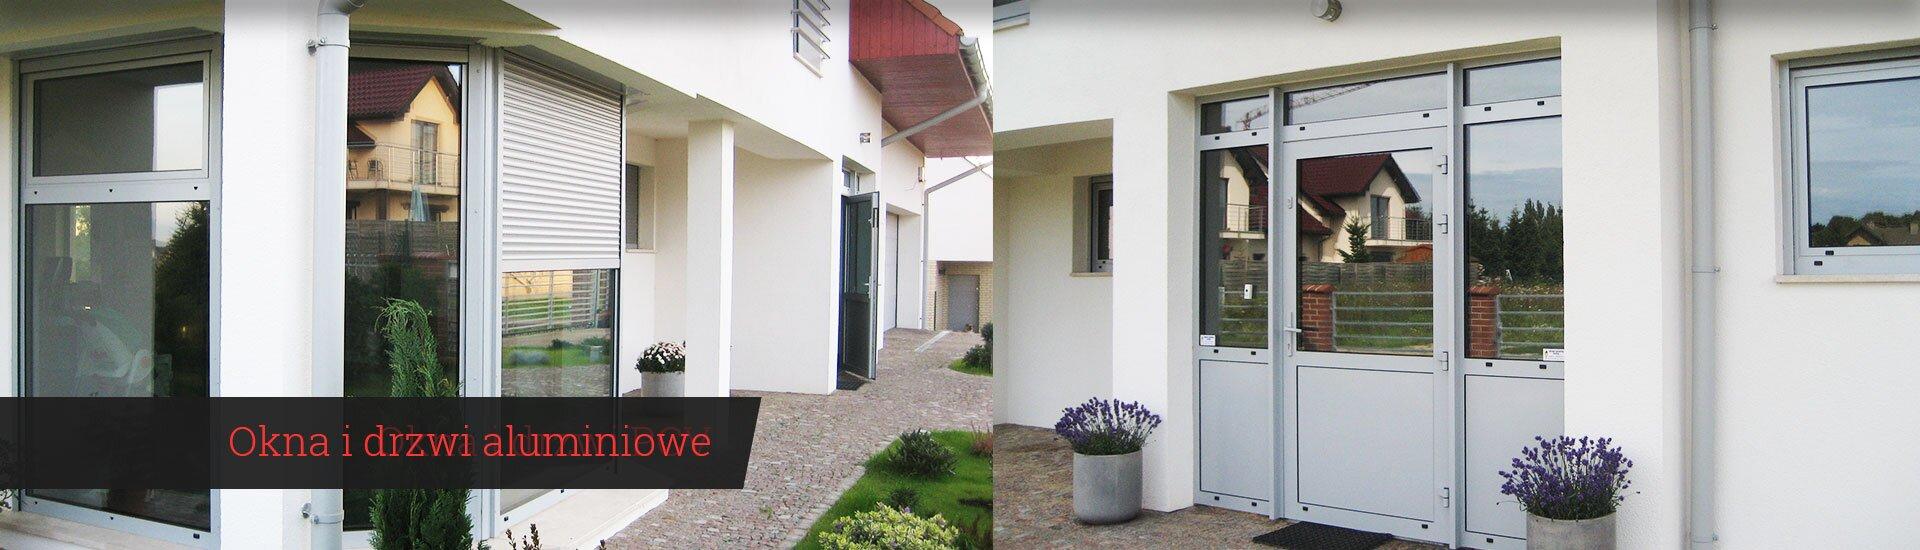 Okna i drzwi aluminiowe